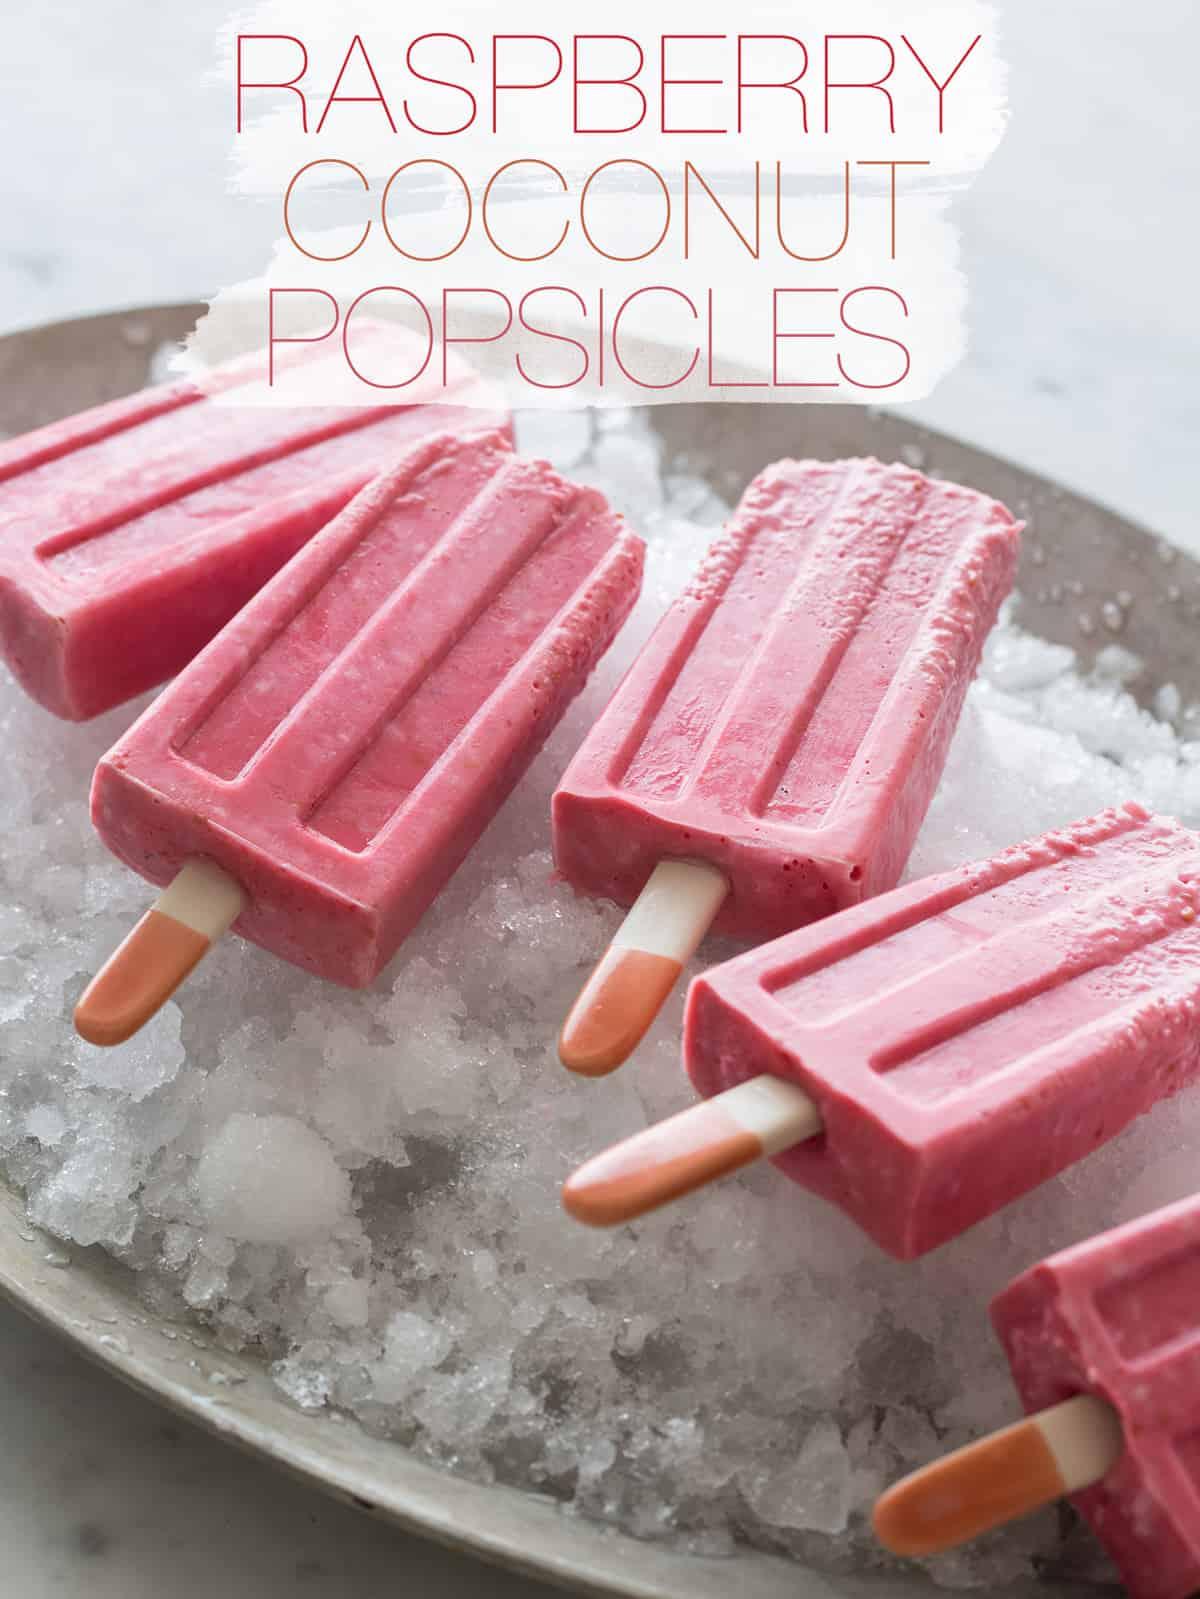 Raspberry Coconut Popsicles Popsicle Recipe Spoon Fork